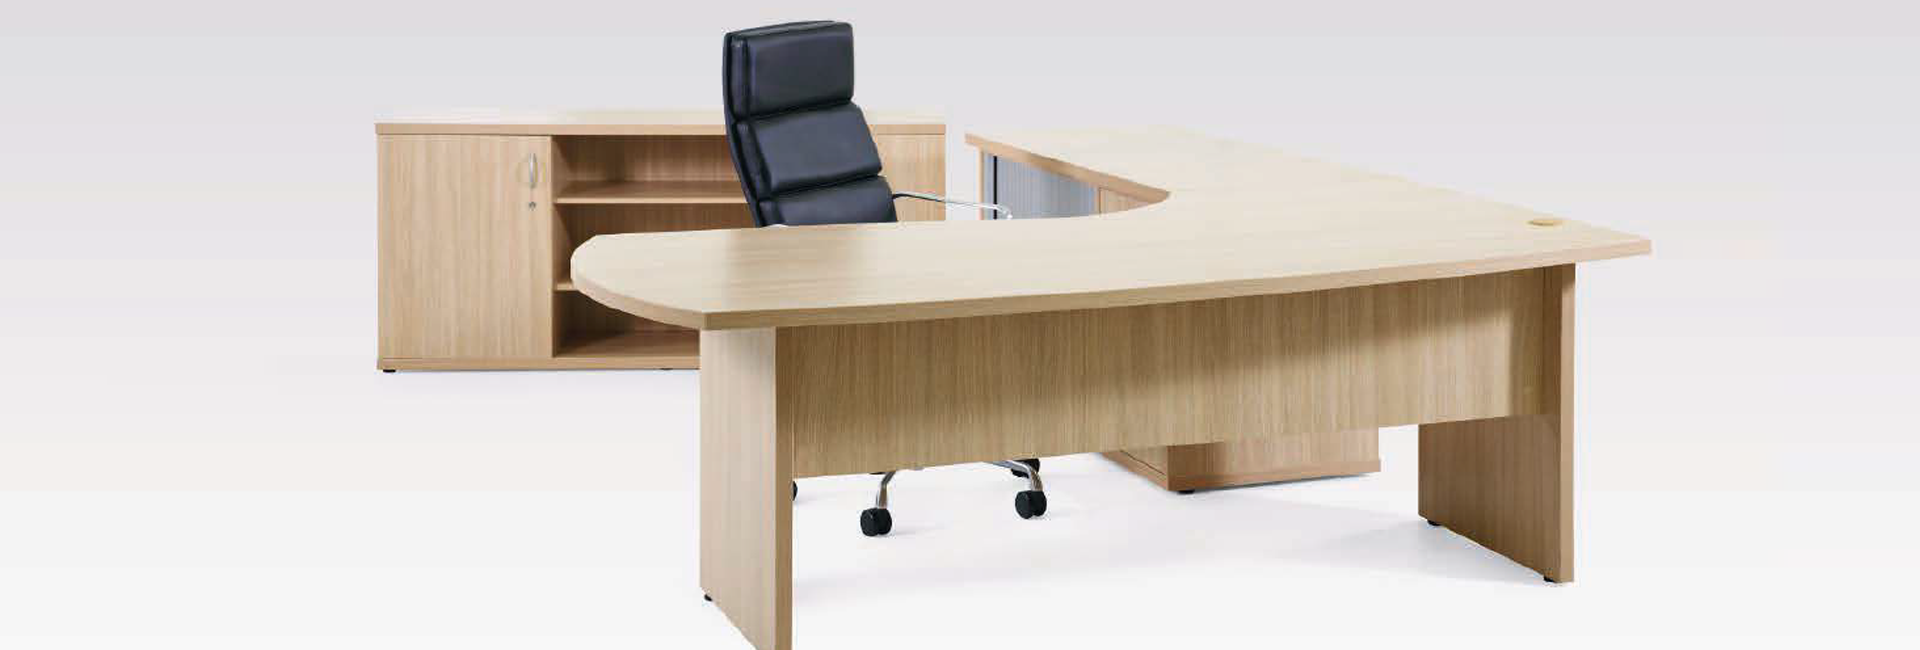 Office Furniture - LPGraphics